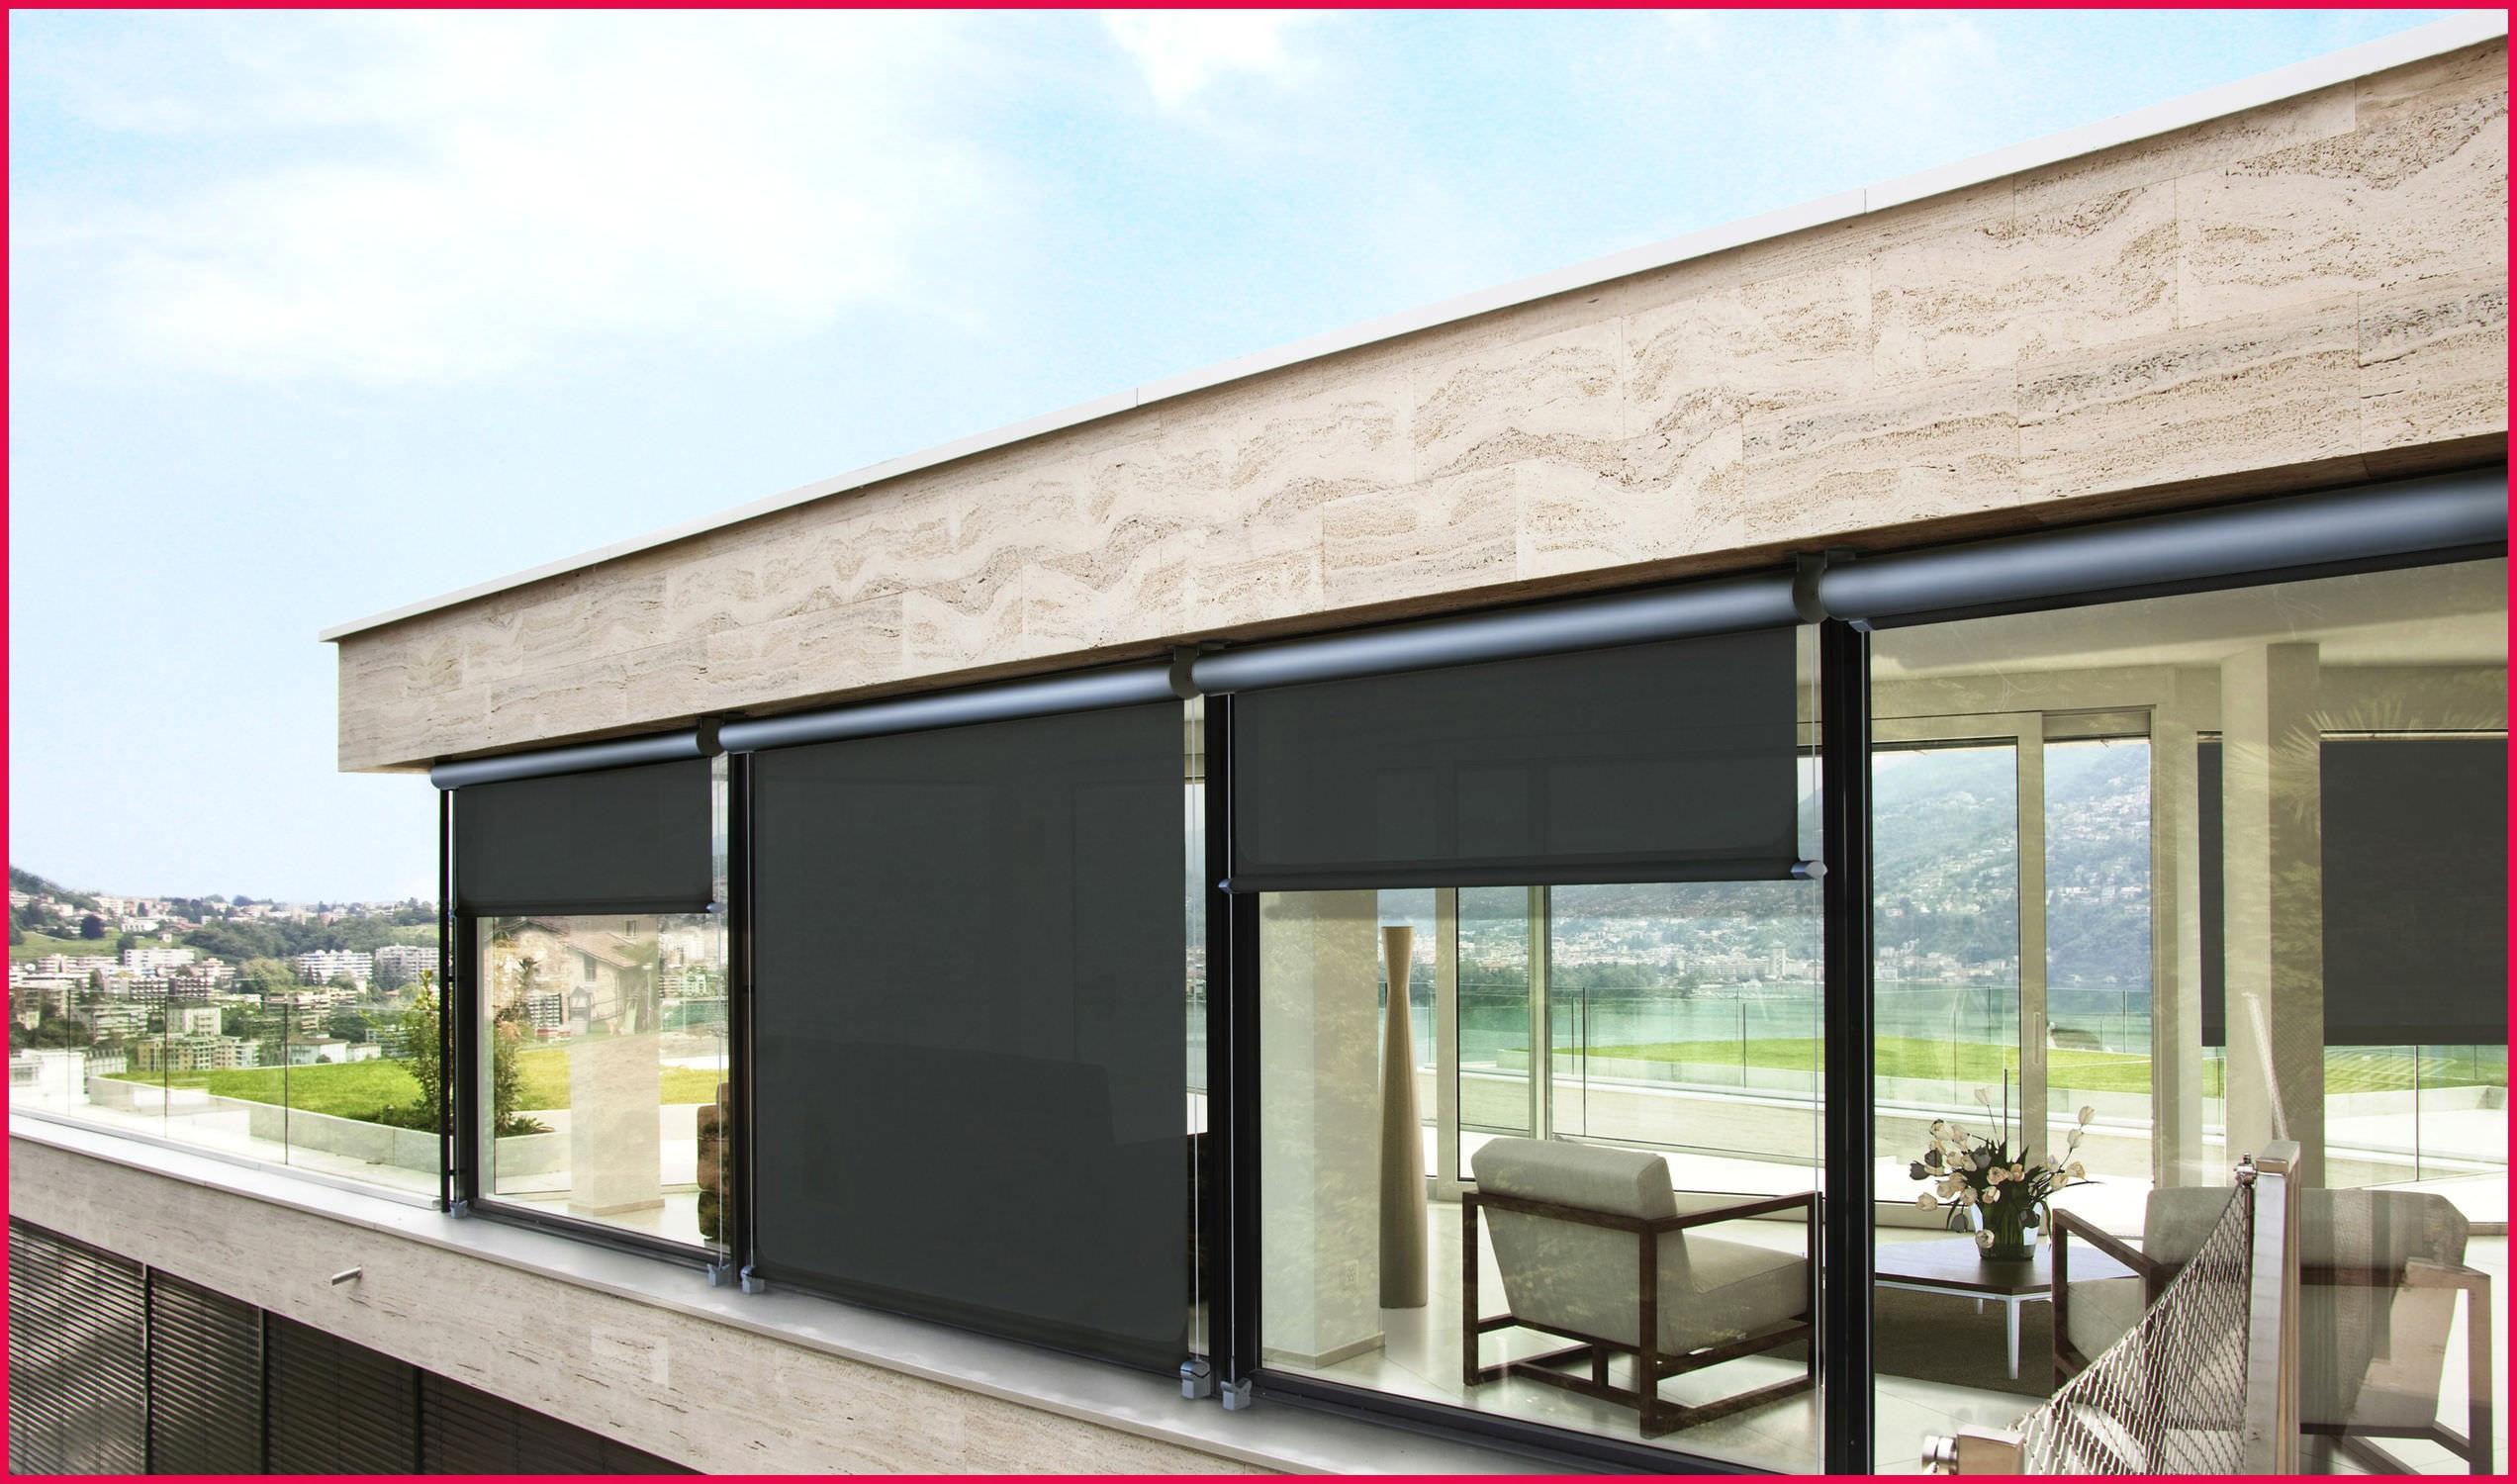 Store veranda exterieur prix - veranda-styledevie.fr